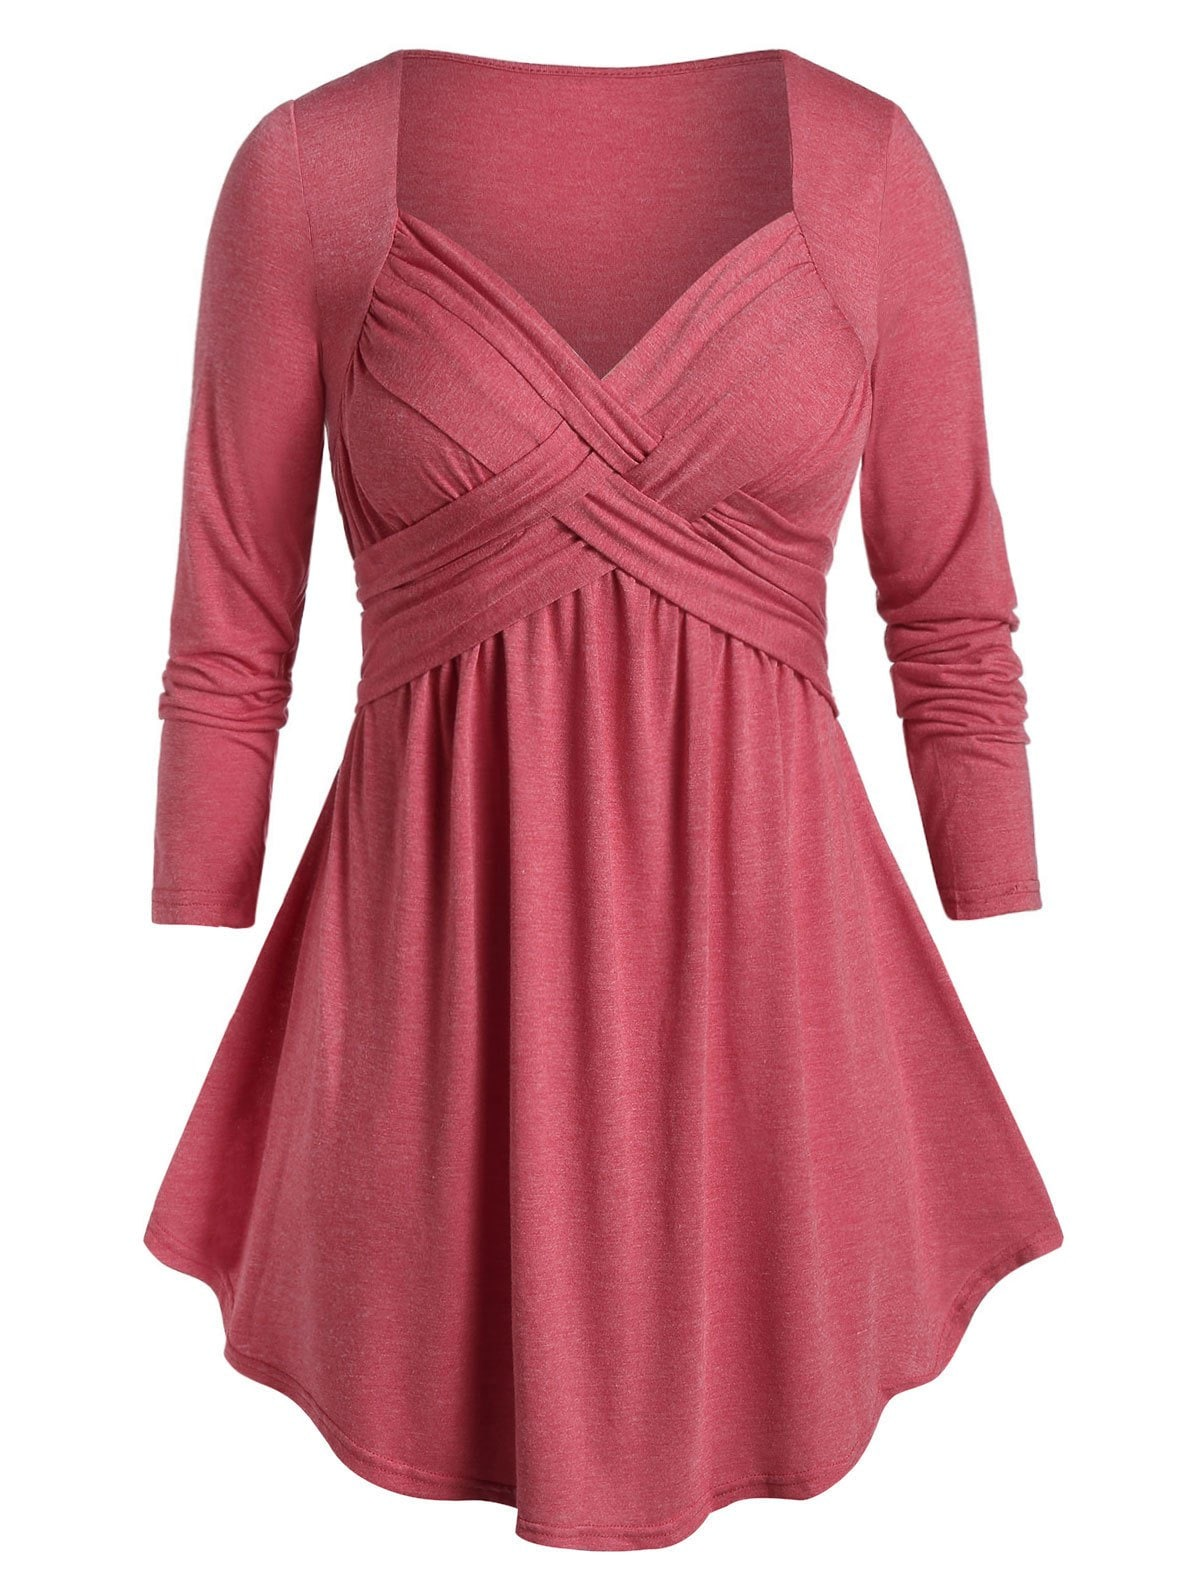 ROSEGAL Plus Size Marled Sweetheart Collar T Shirt